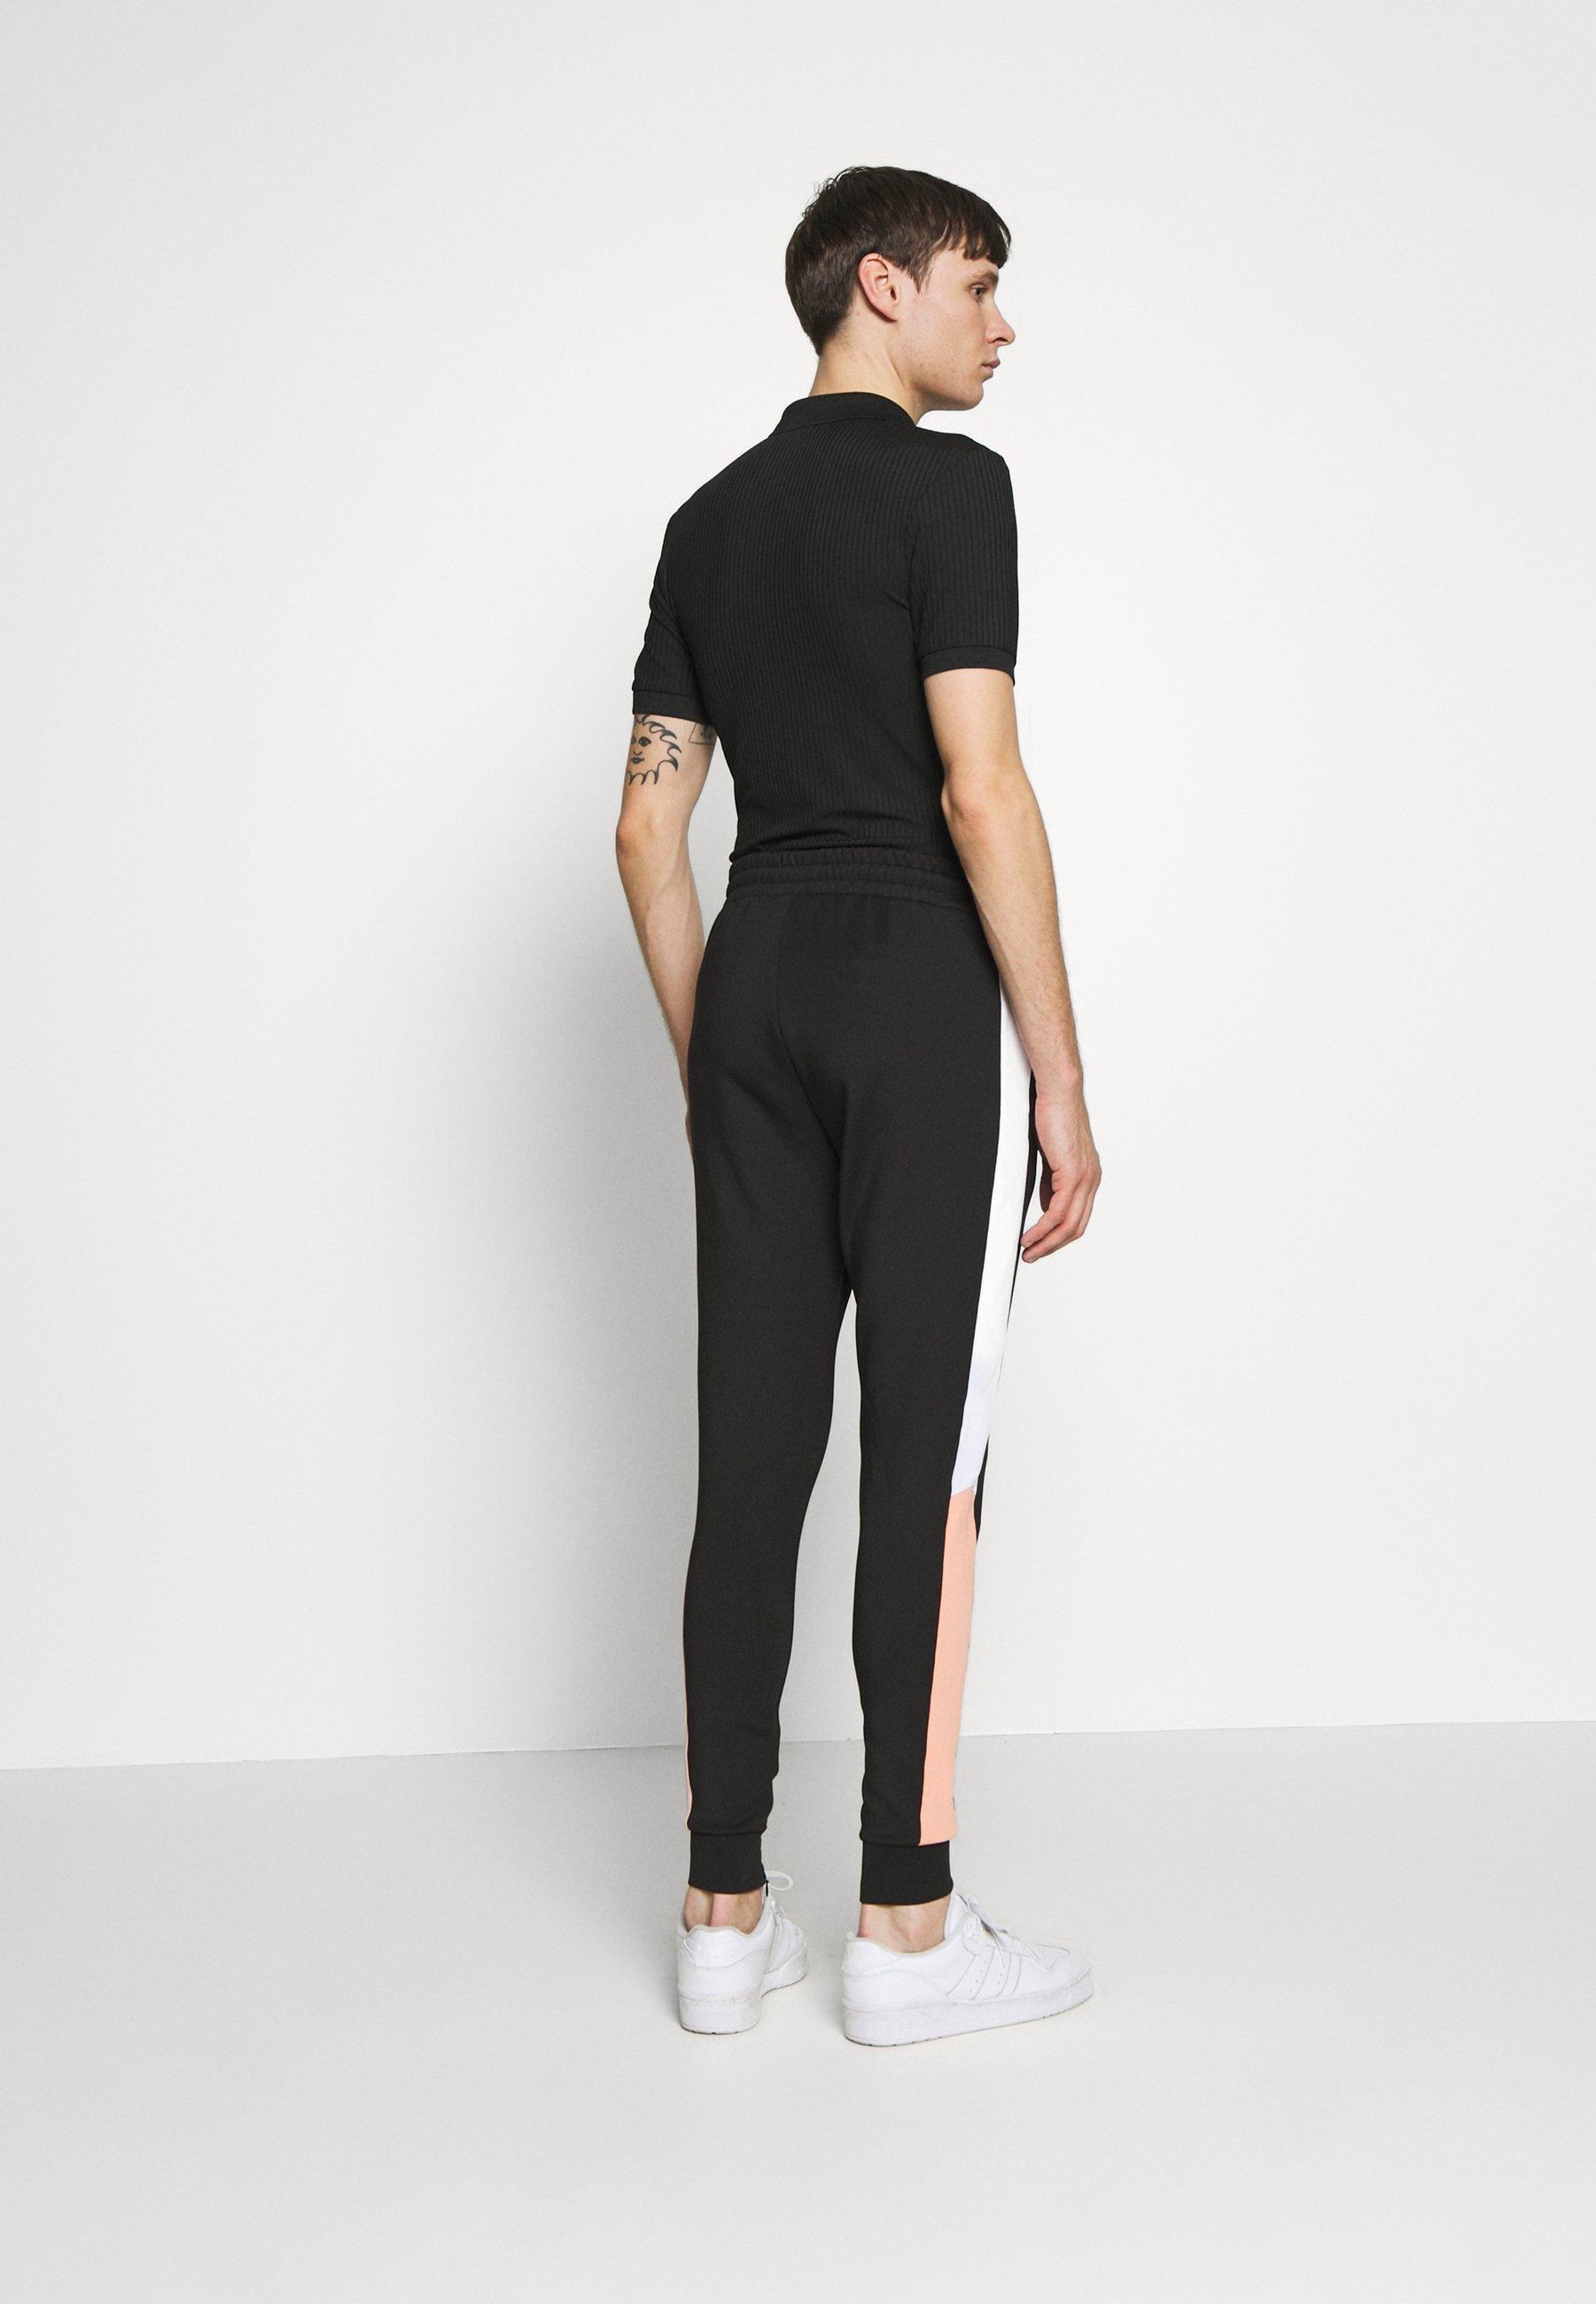 11 DEGREES PANEL BLOCK TRACK PANTS - Spodnie treningowe - peach melba/black/white